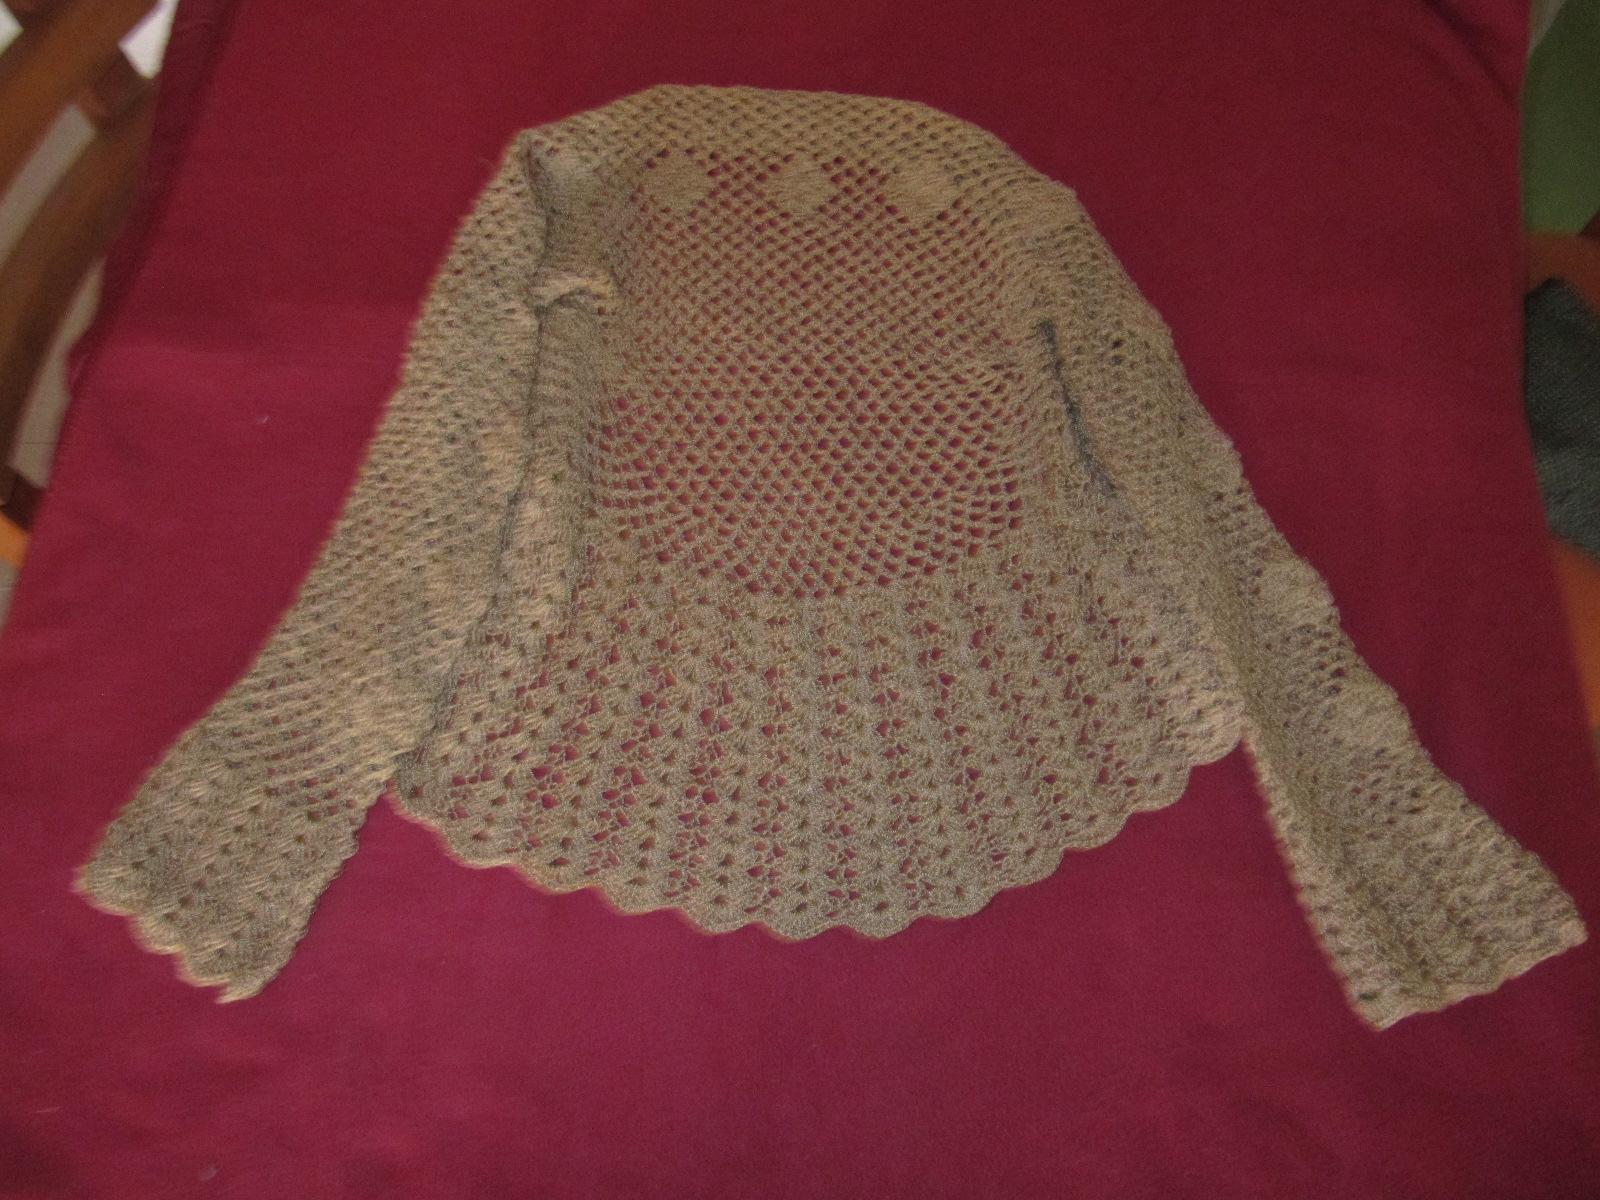 Tejidos Mano Palillos Crochet | Kamistad Celebrity Pictures Portal